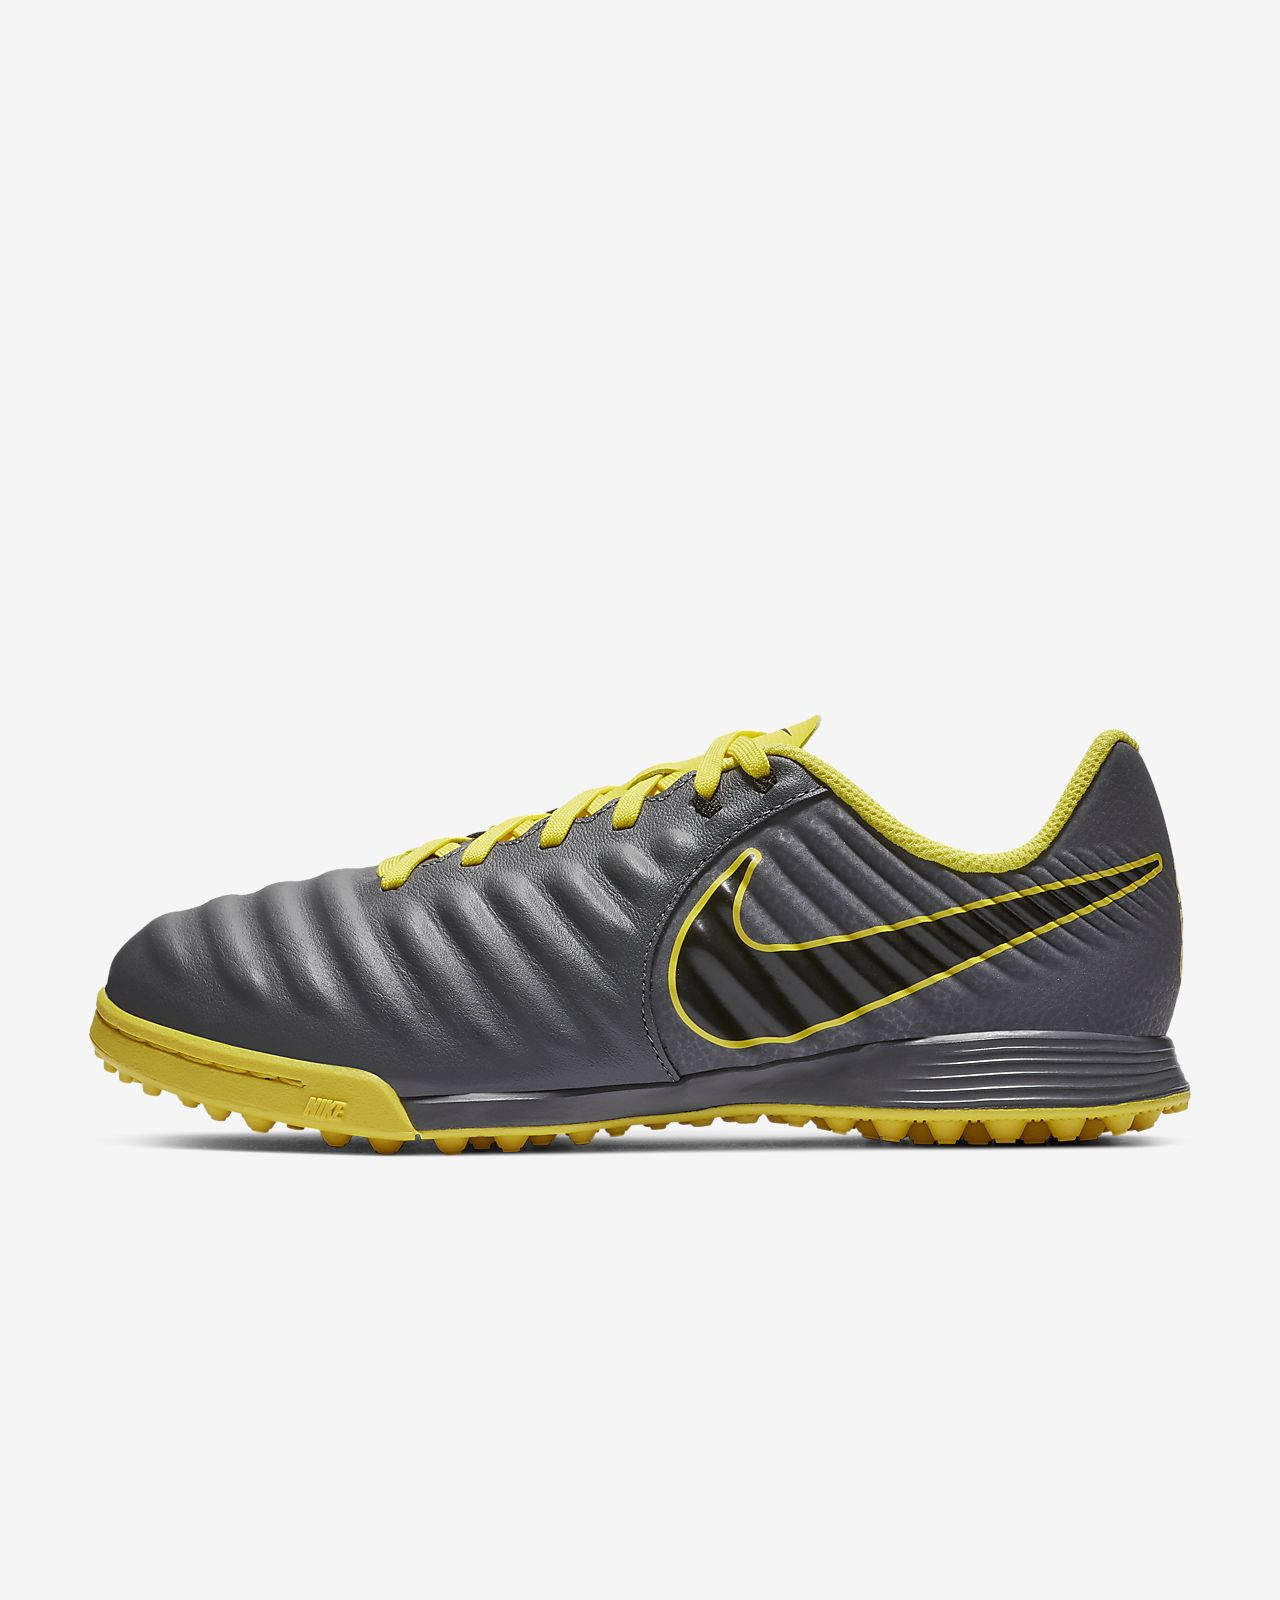 Calzado de fútbol de césped artificial para niños de talla pequeña grande  Nike Jr. 8817f17fda2e7